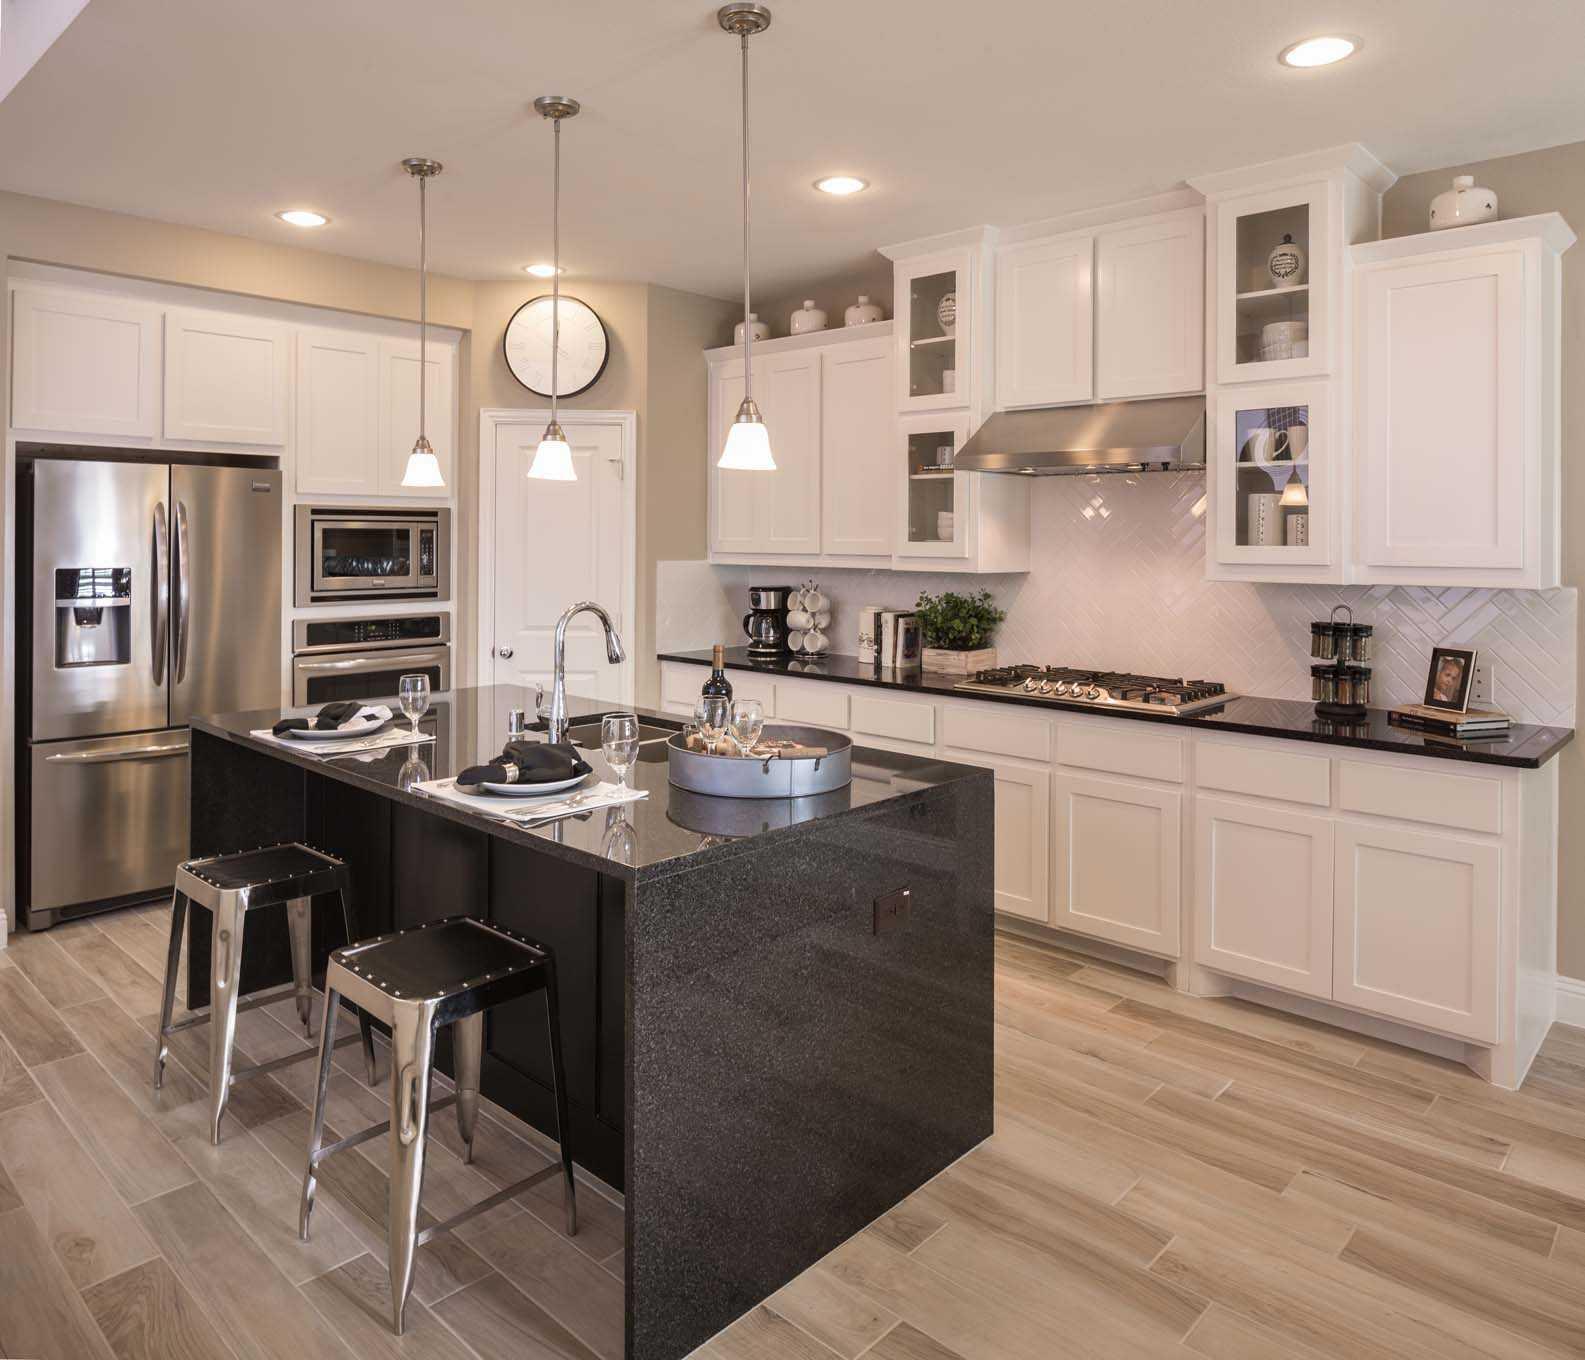 Village Kitchen Farmingdale: Model Home In Dallas / Fort Worth Texas, Timber Creek 60s